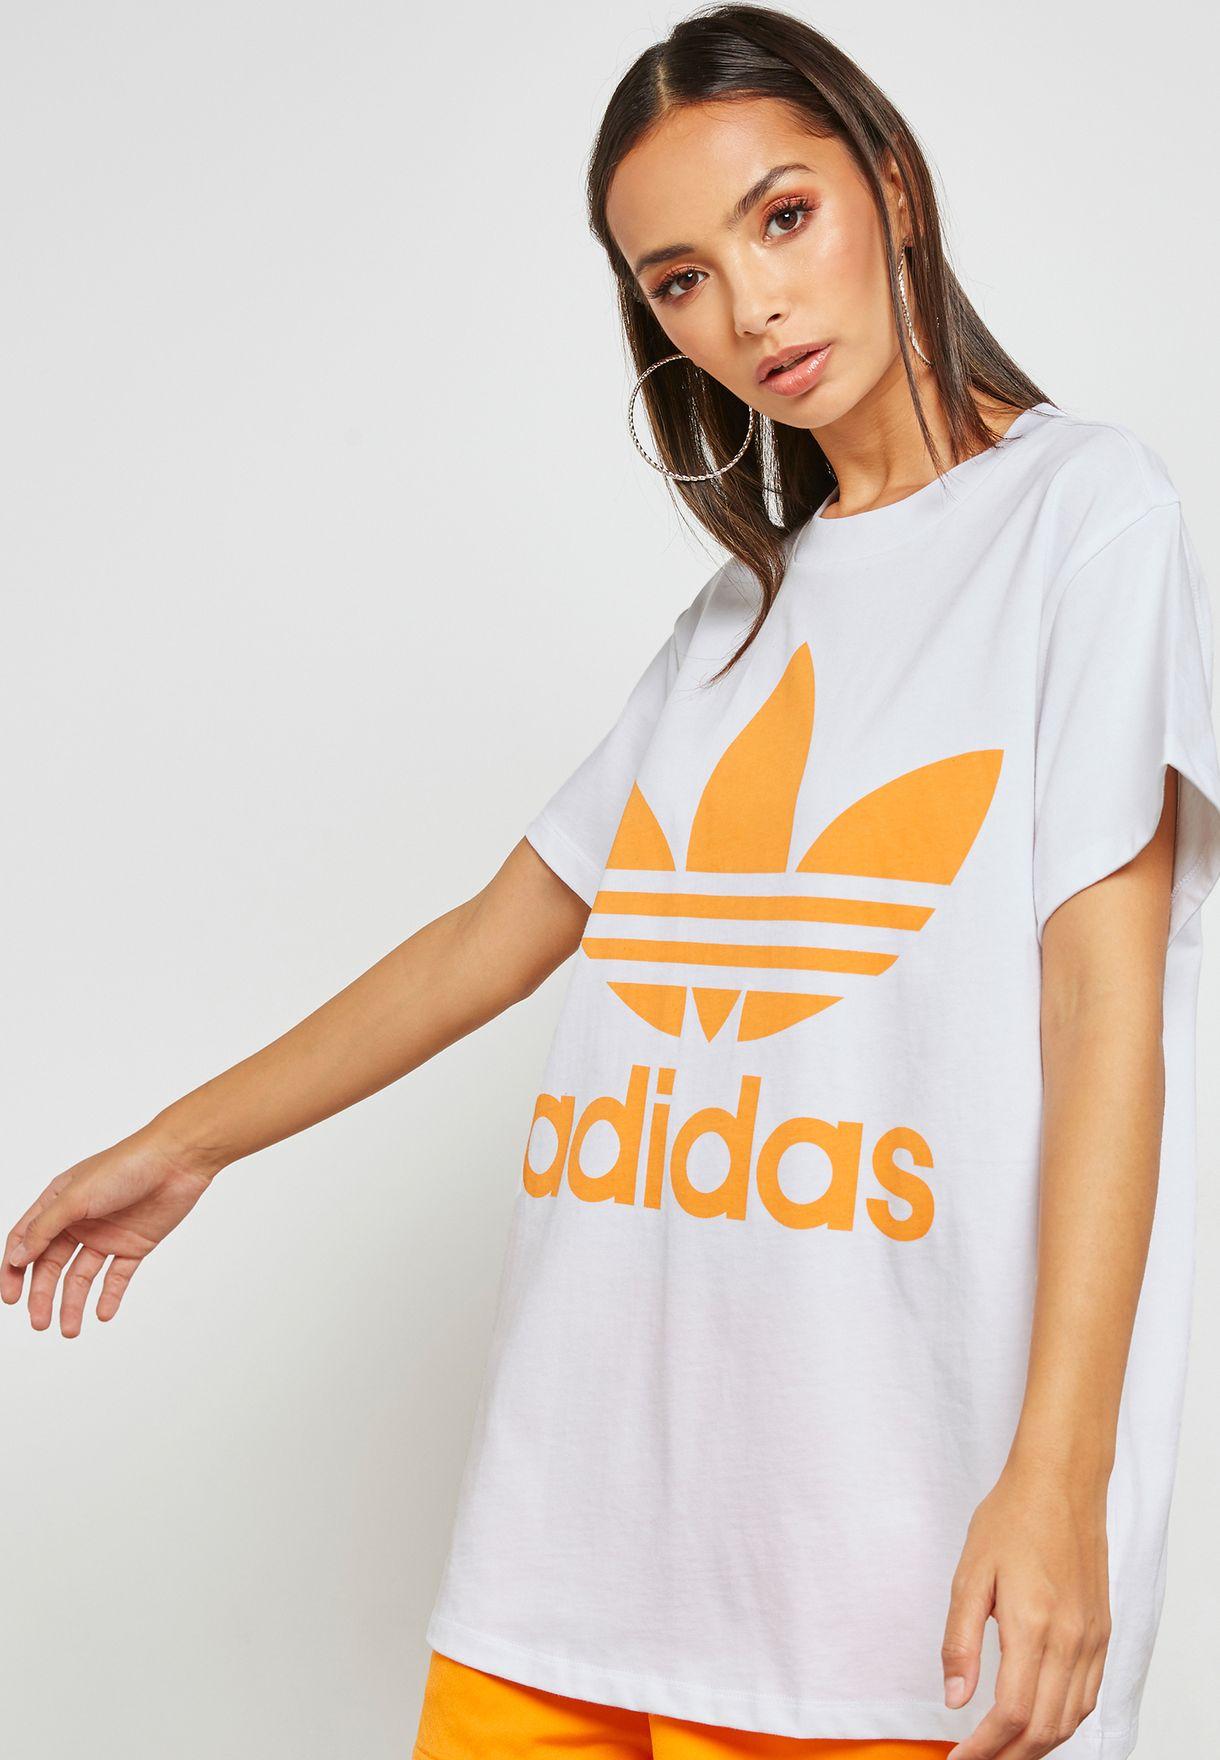 sale retailer 7353e 6b9fd Shop adidas Originals white adicolor Trefoil T-Shirt DH3165 for Women in  Kuwait - AD478AT64YFJ